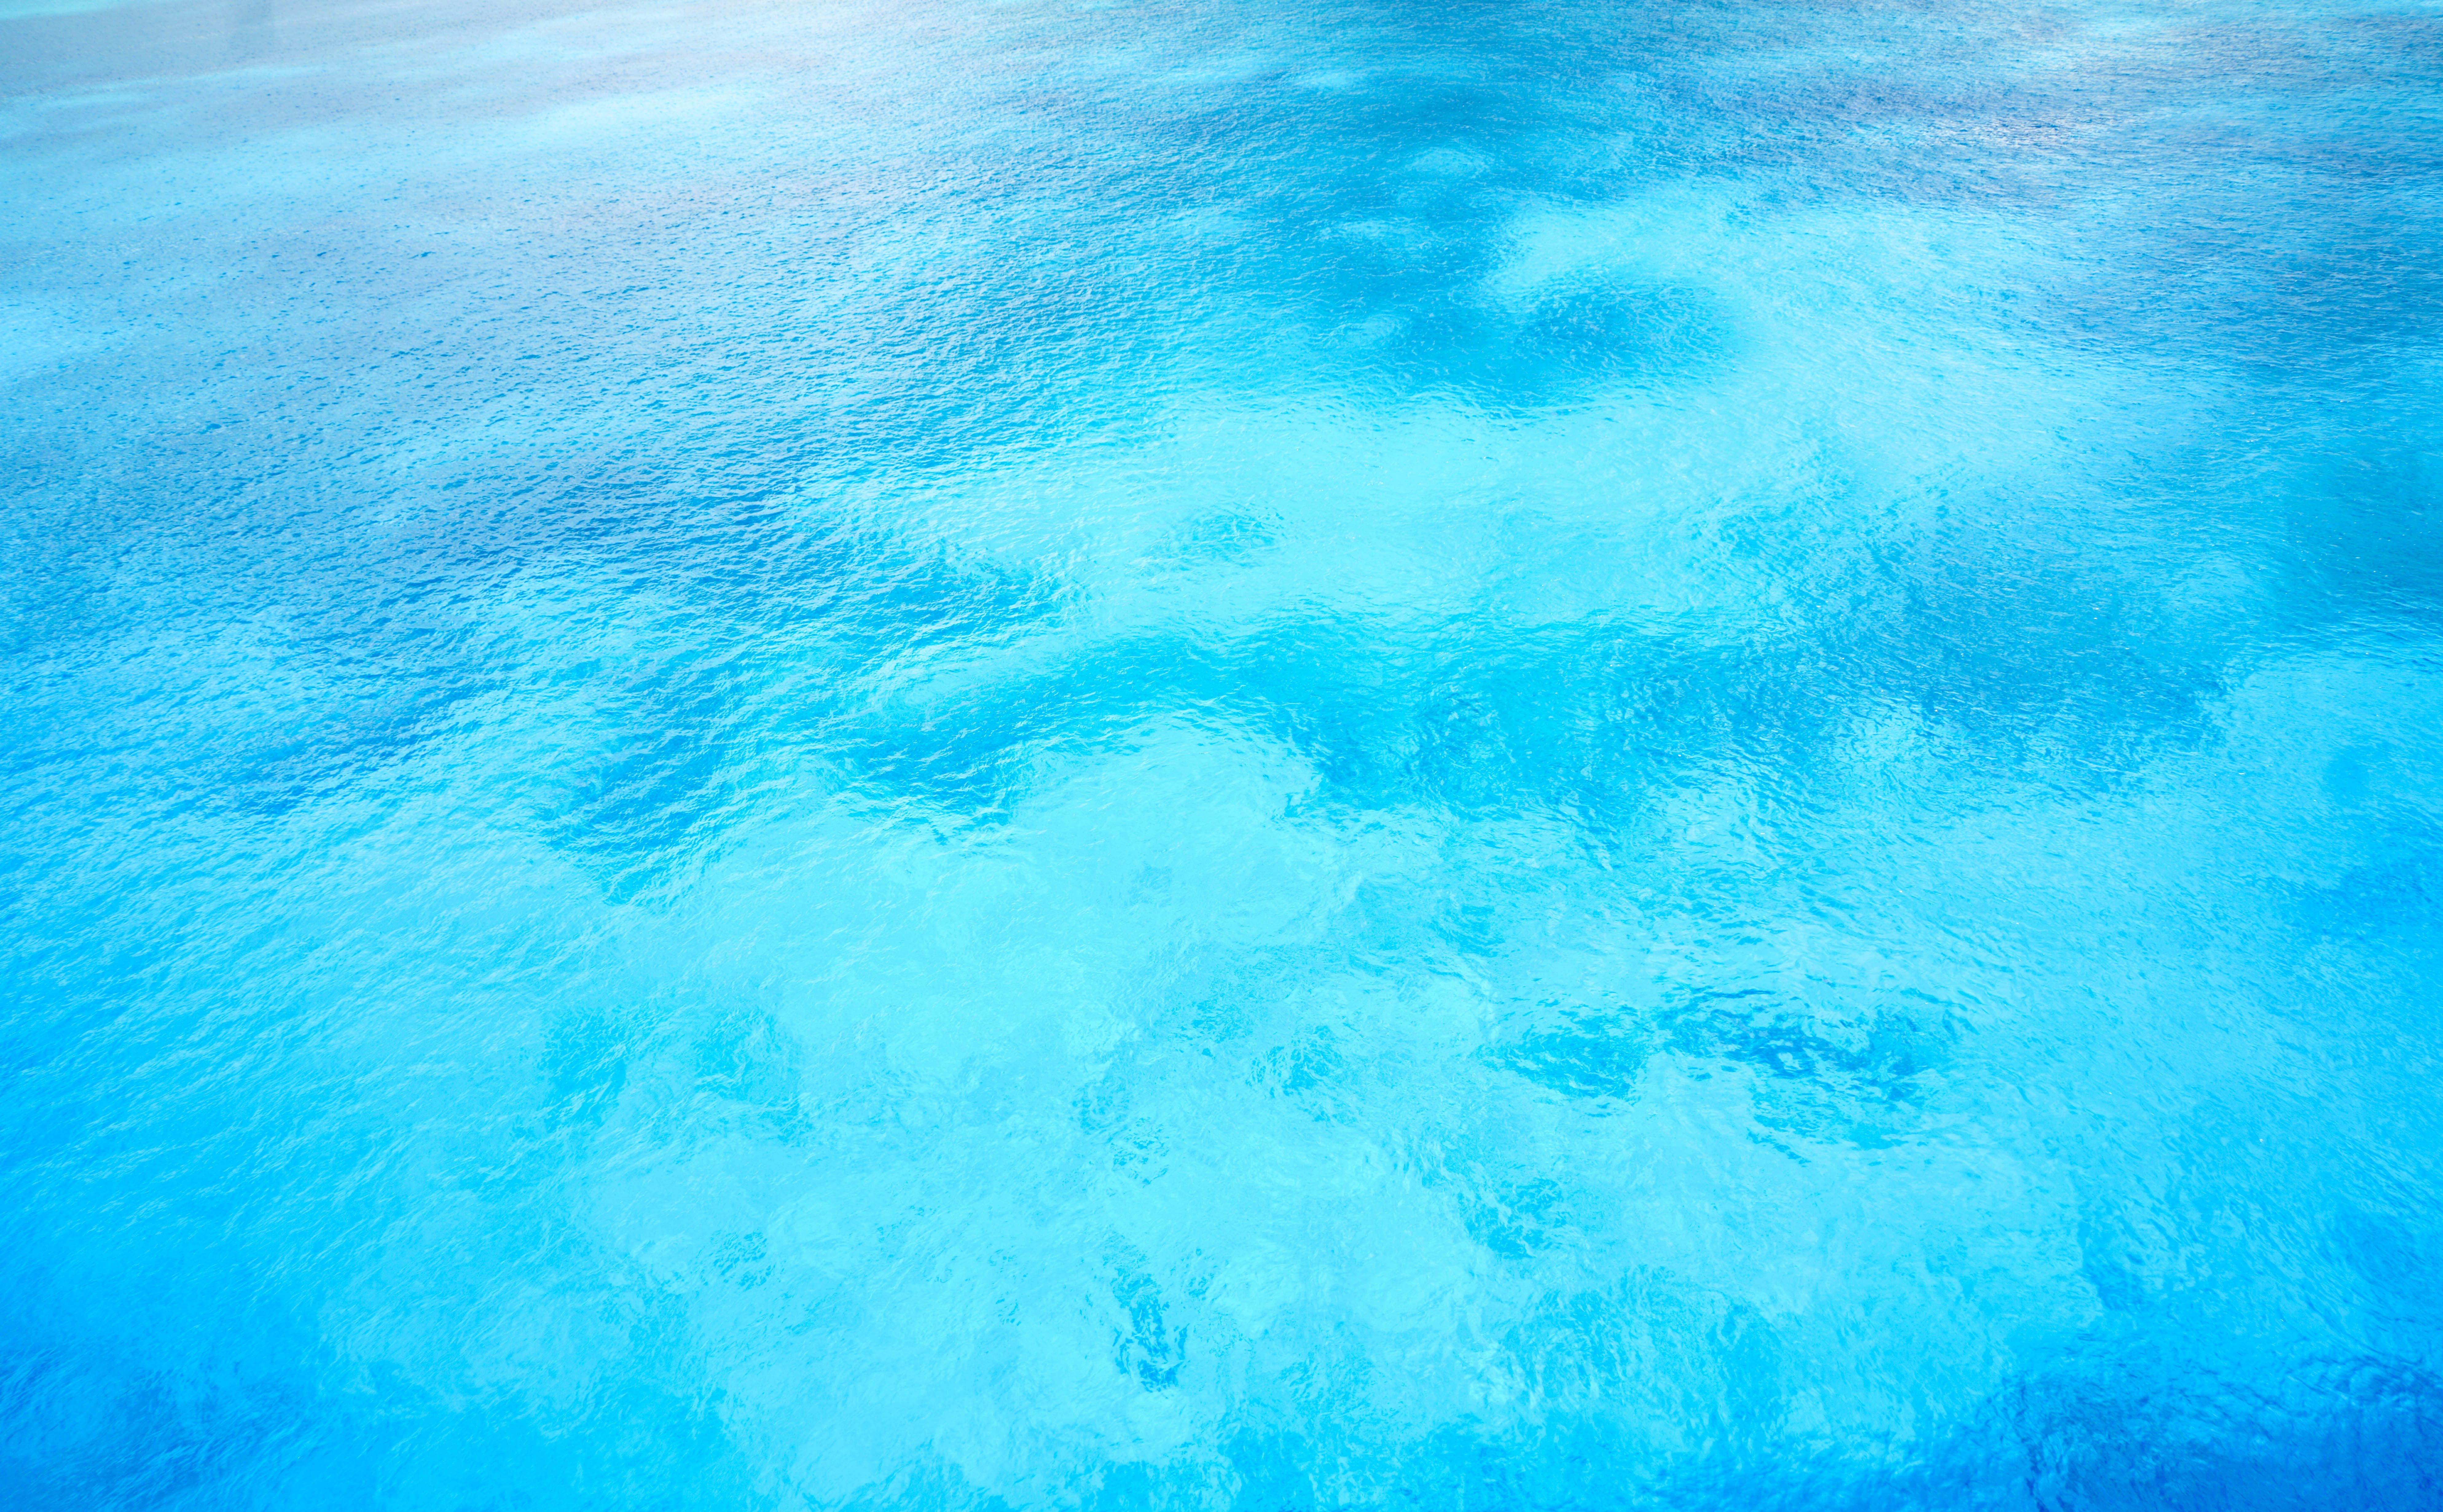 Color Palette – shades of van gogh blue –  #43d3f6, #77d9f4, #a8dcf5, #0bbff5, #0494ea – Blue Dacnis color, Heisenberg Blue color, Van Gogh Blue color, Spiro Disco Ball color, Pervenche color